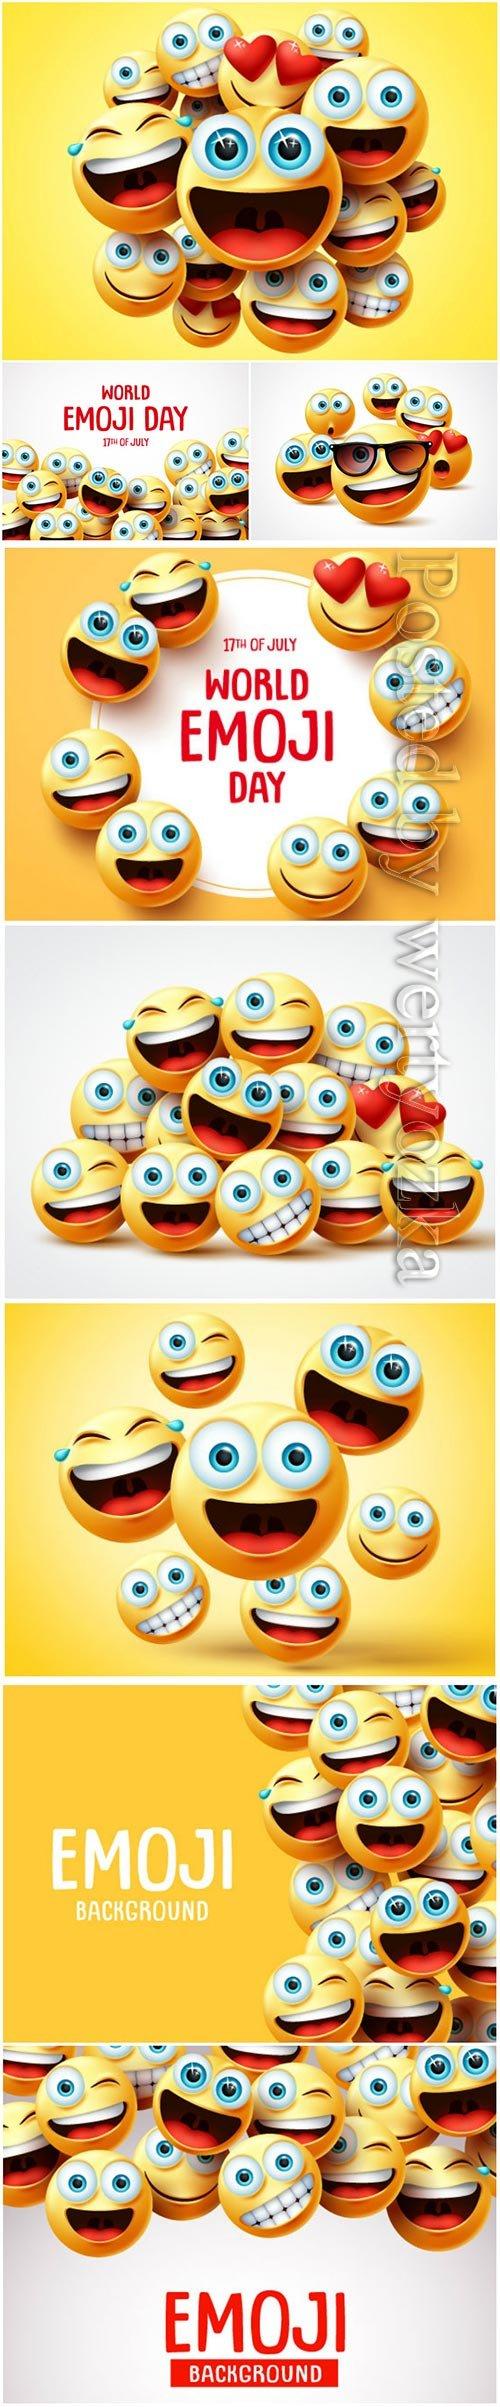 Smiley emoji faces group vector design